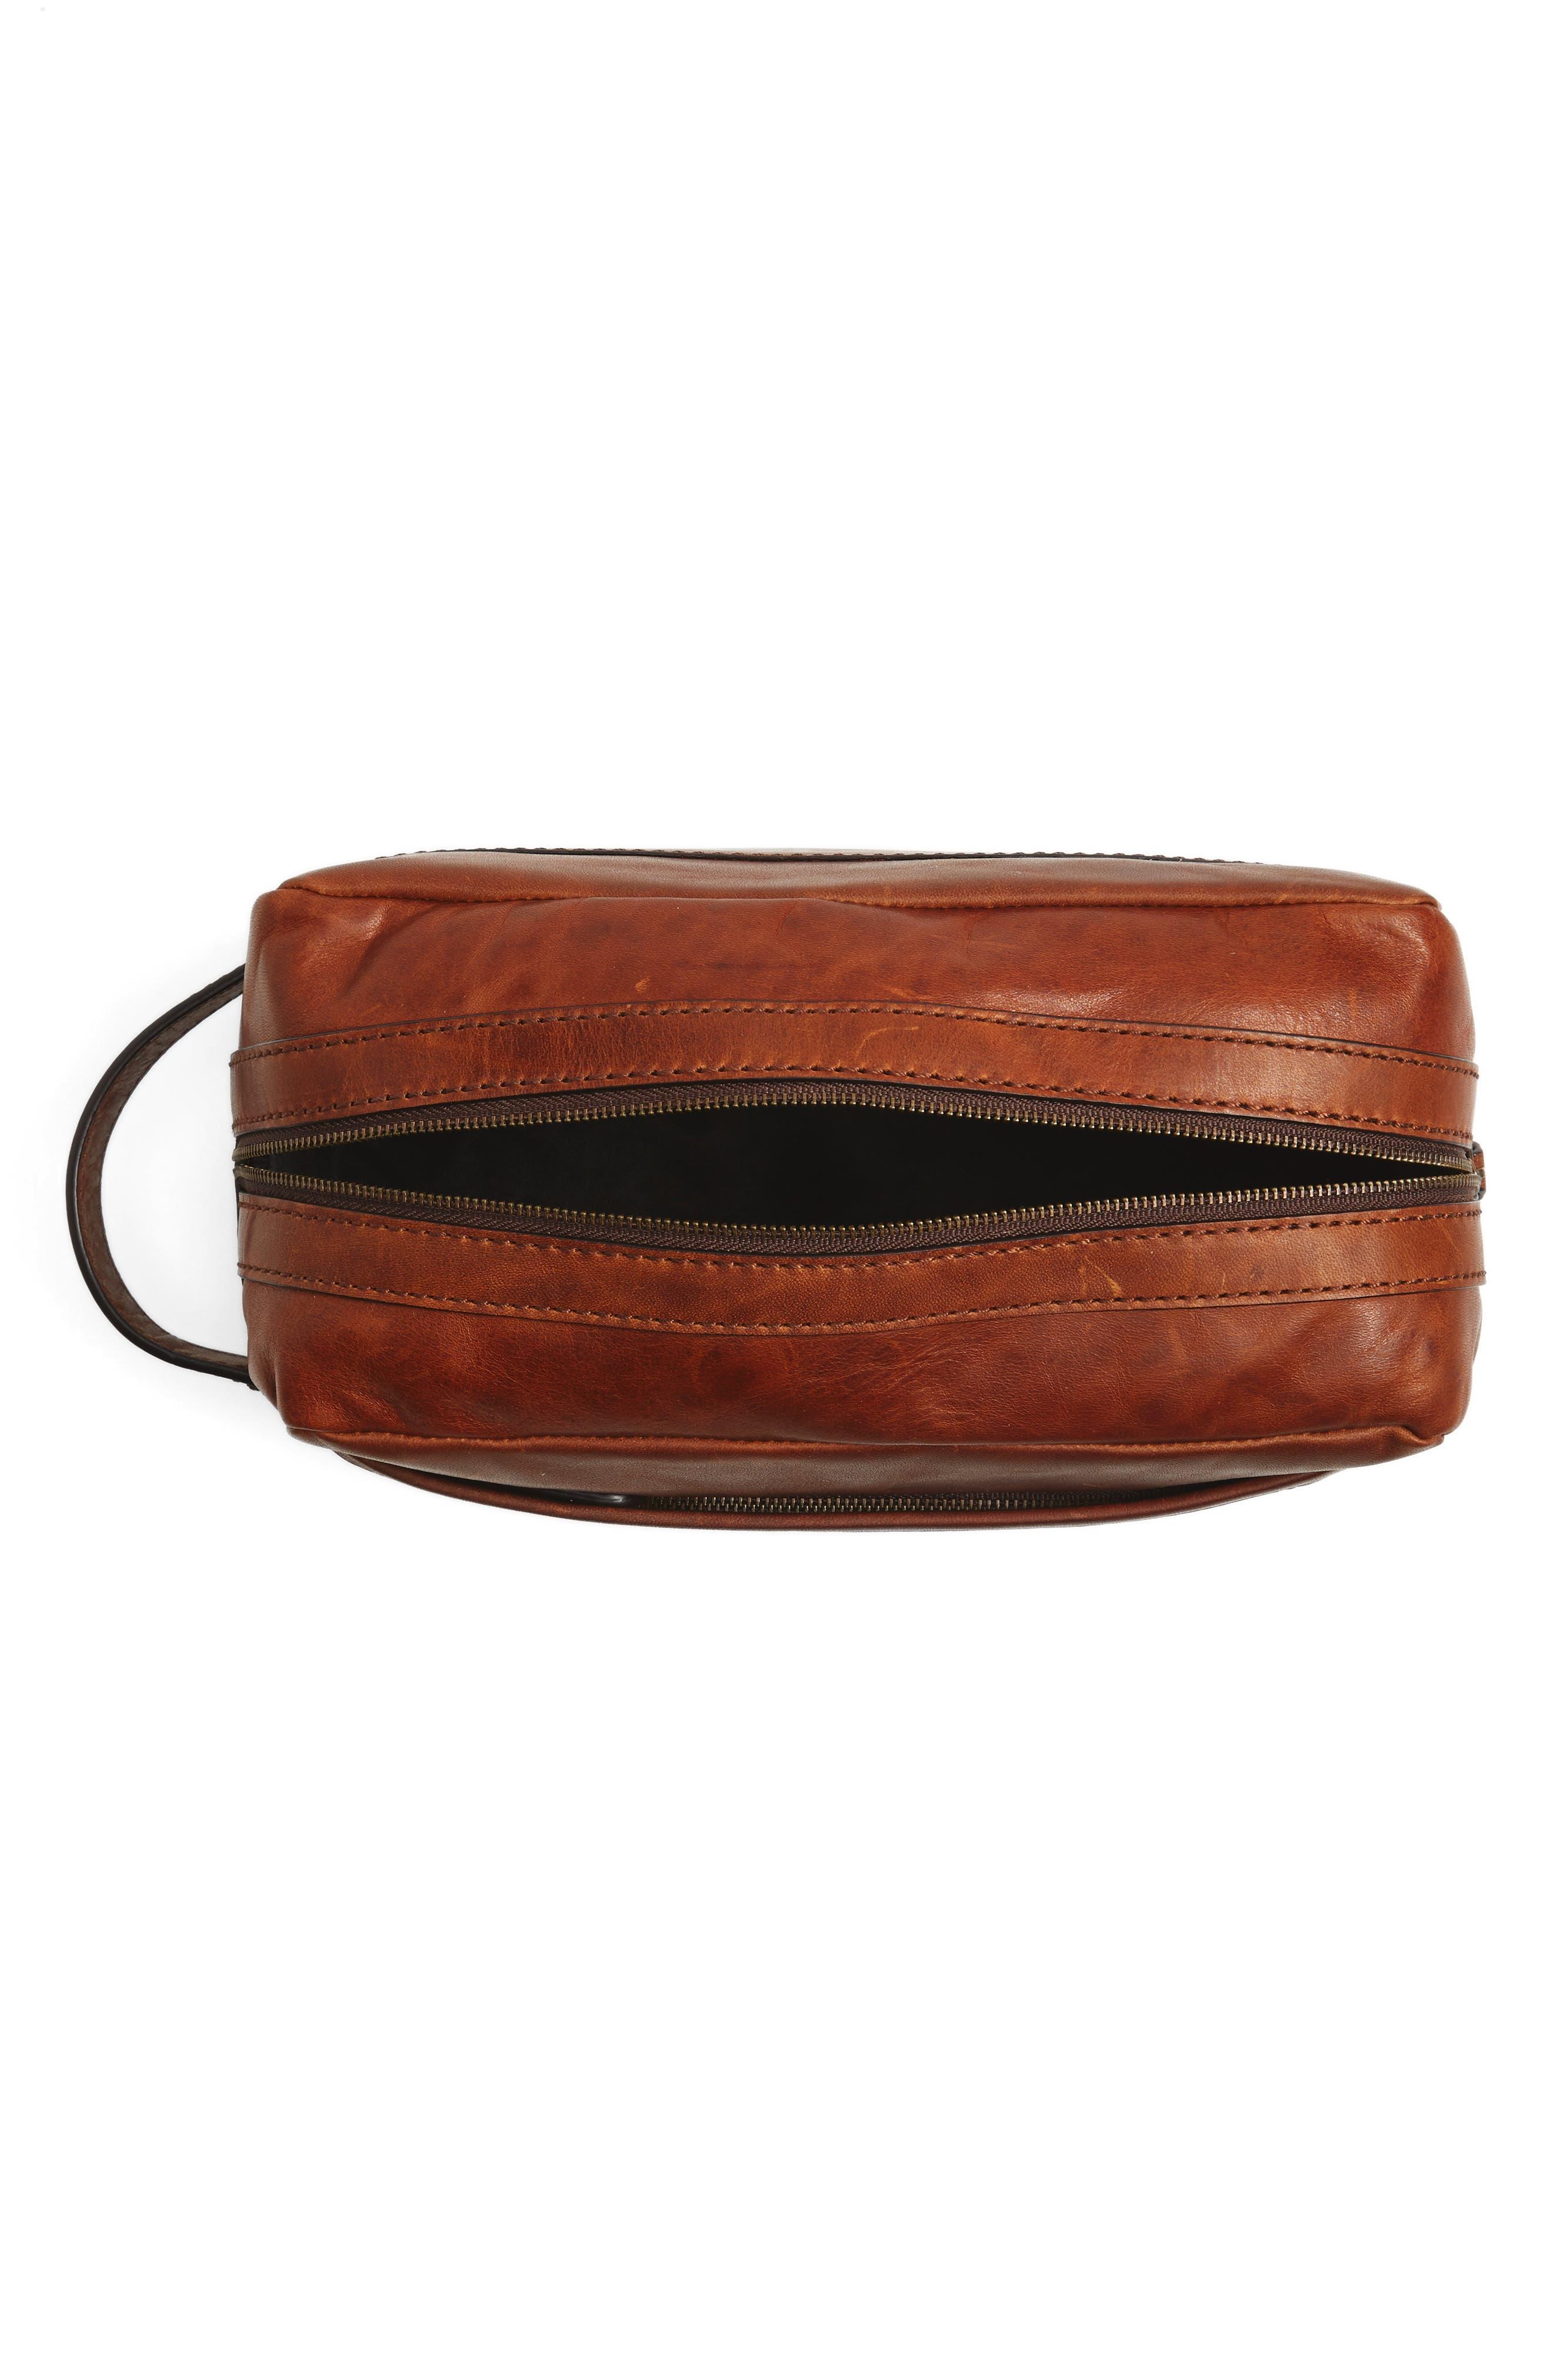 'Logan' Leather Travel Kit,                             Alternate thumbnail 4, color,                             Cognac